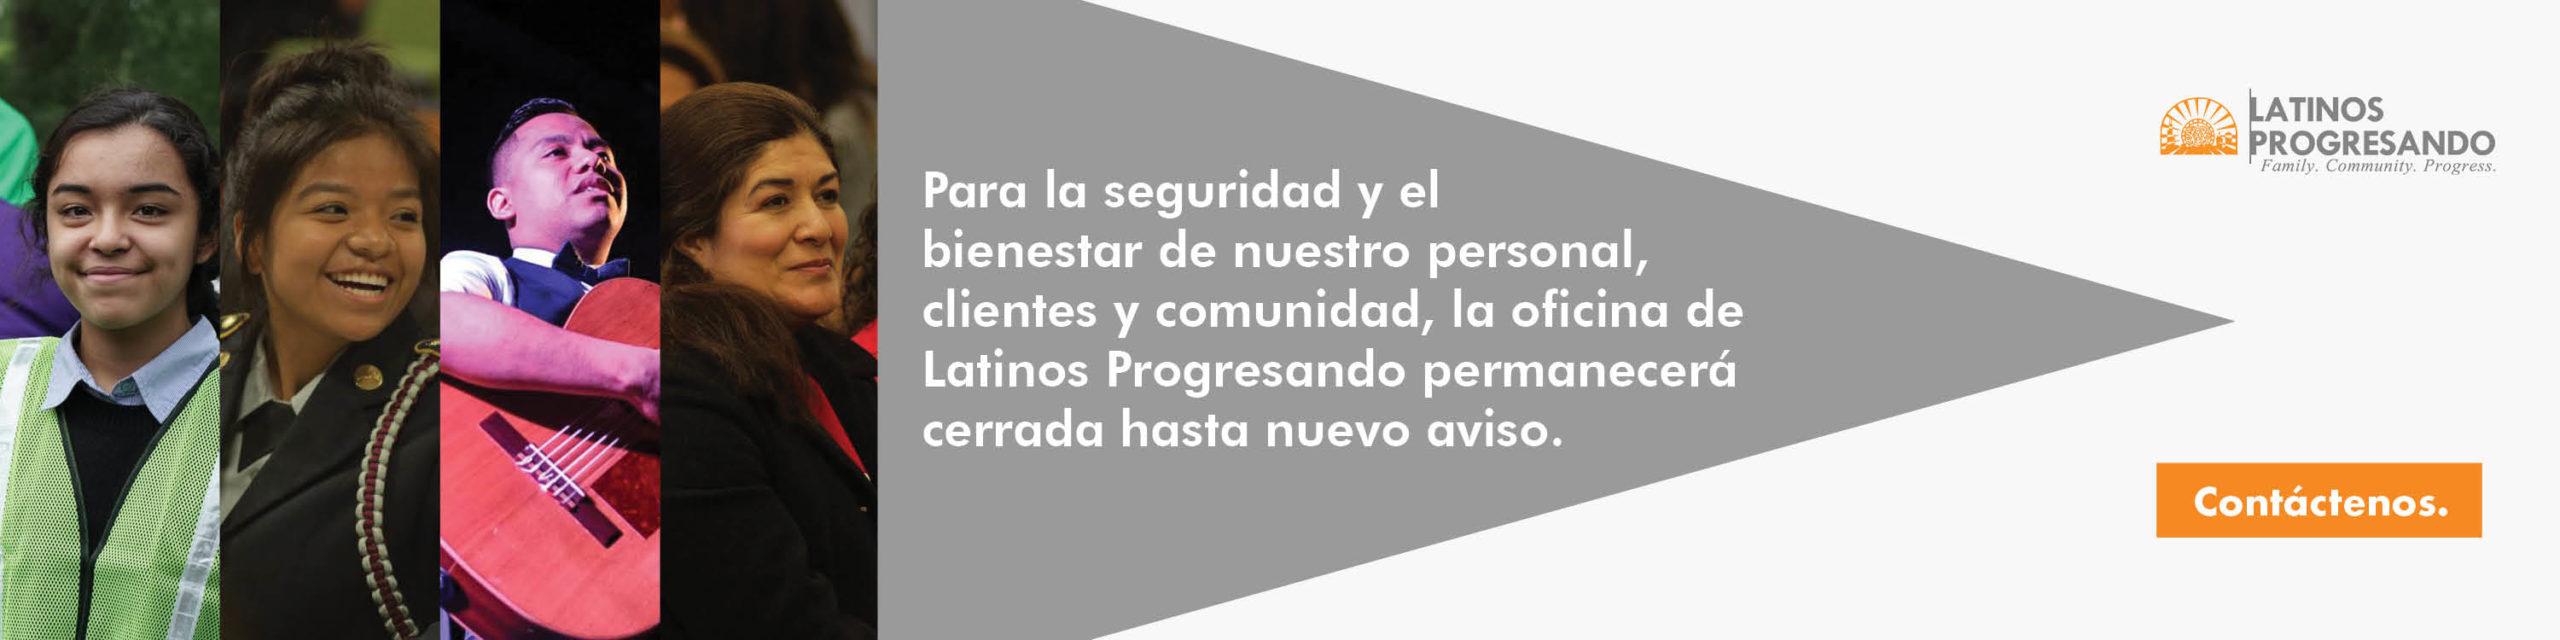 Latinos Progresando Office Closure